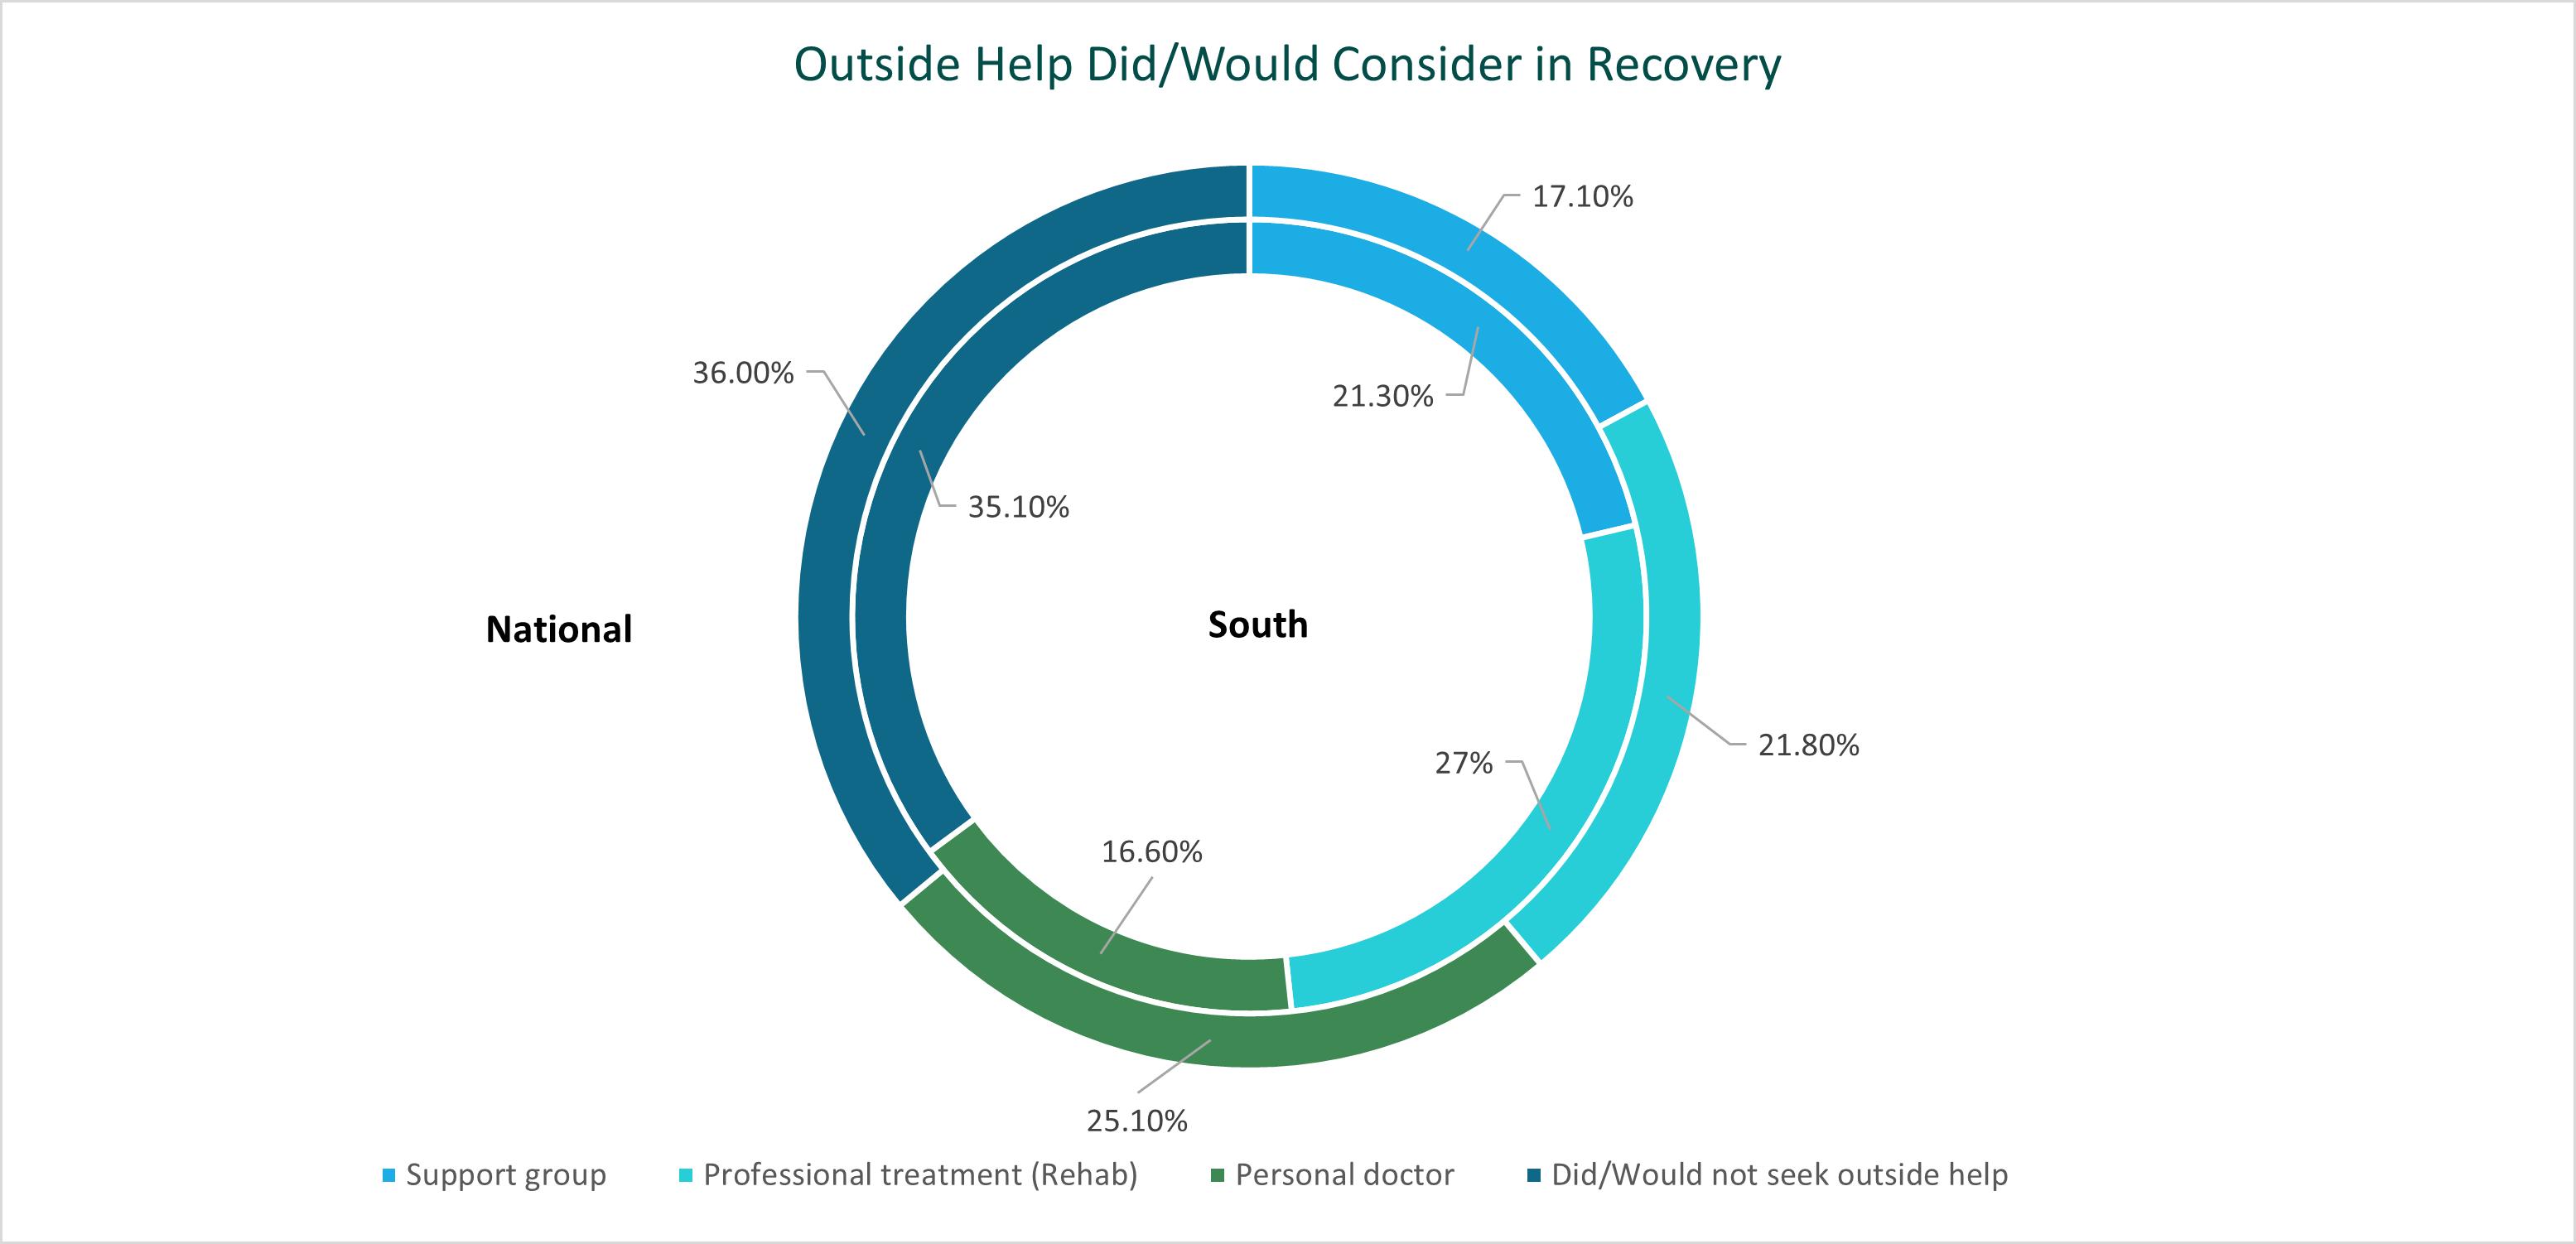 alcohol use survey x geo - seeking outside help for alcohol addiction